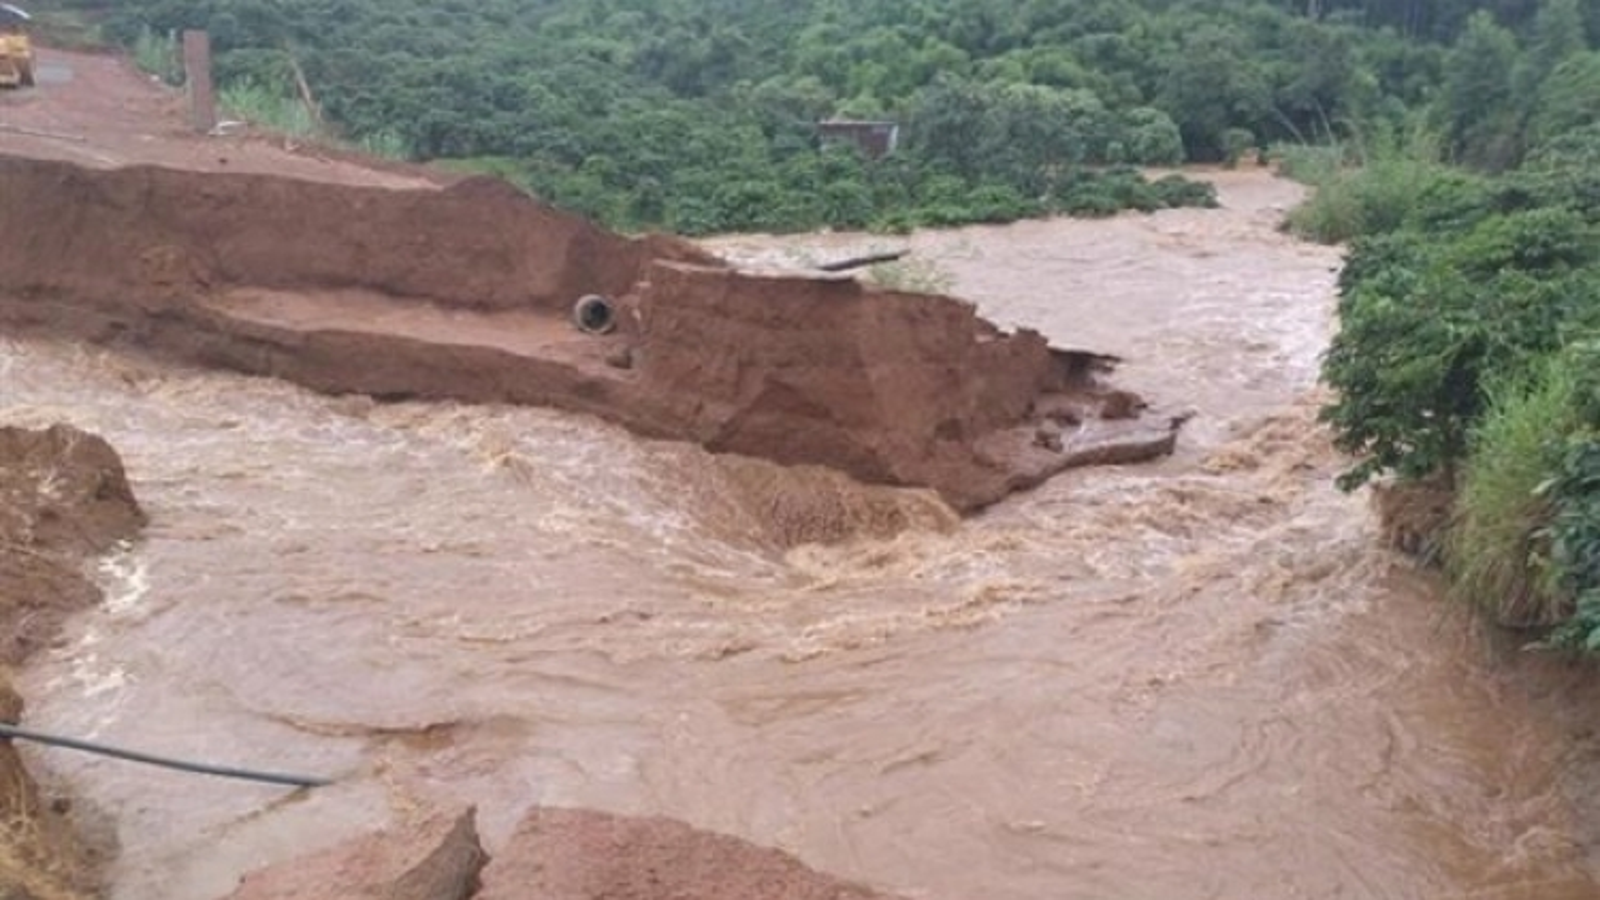 Vietnam witnesses 10-15 flash floods each year